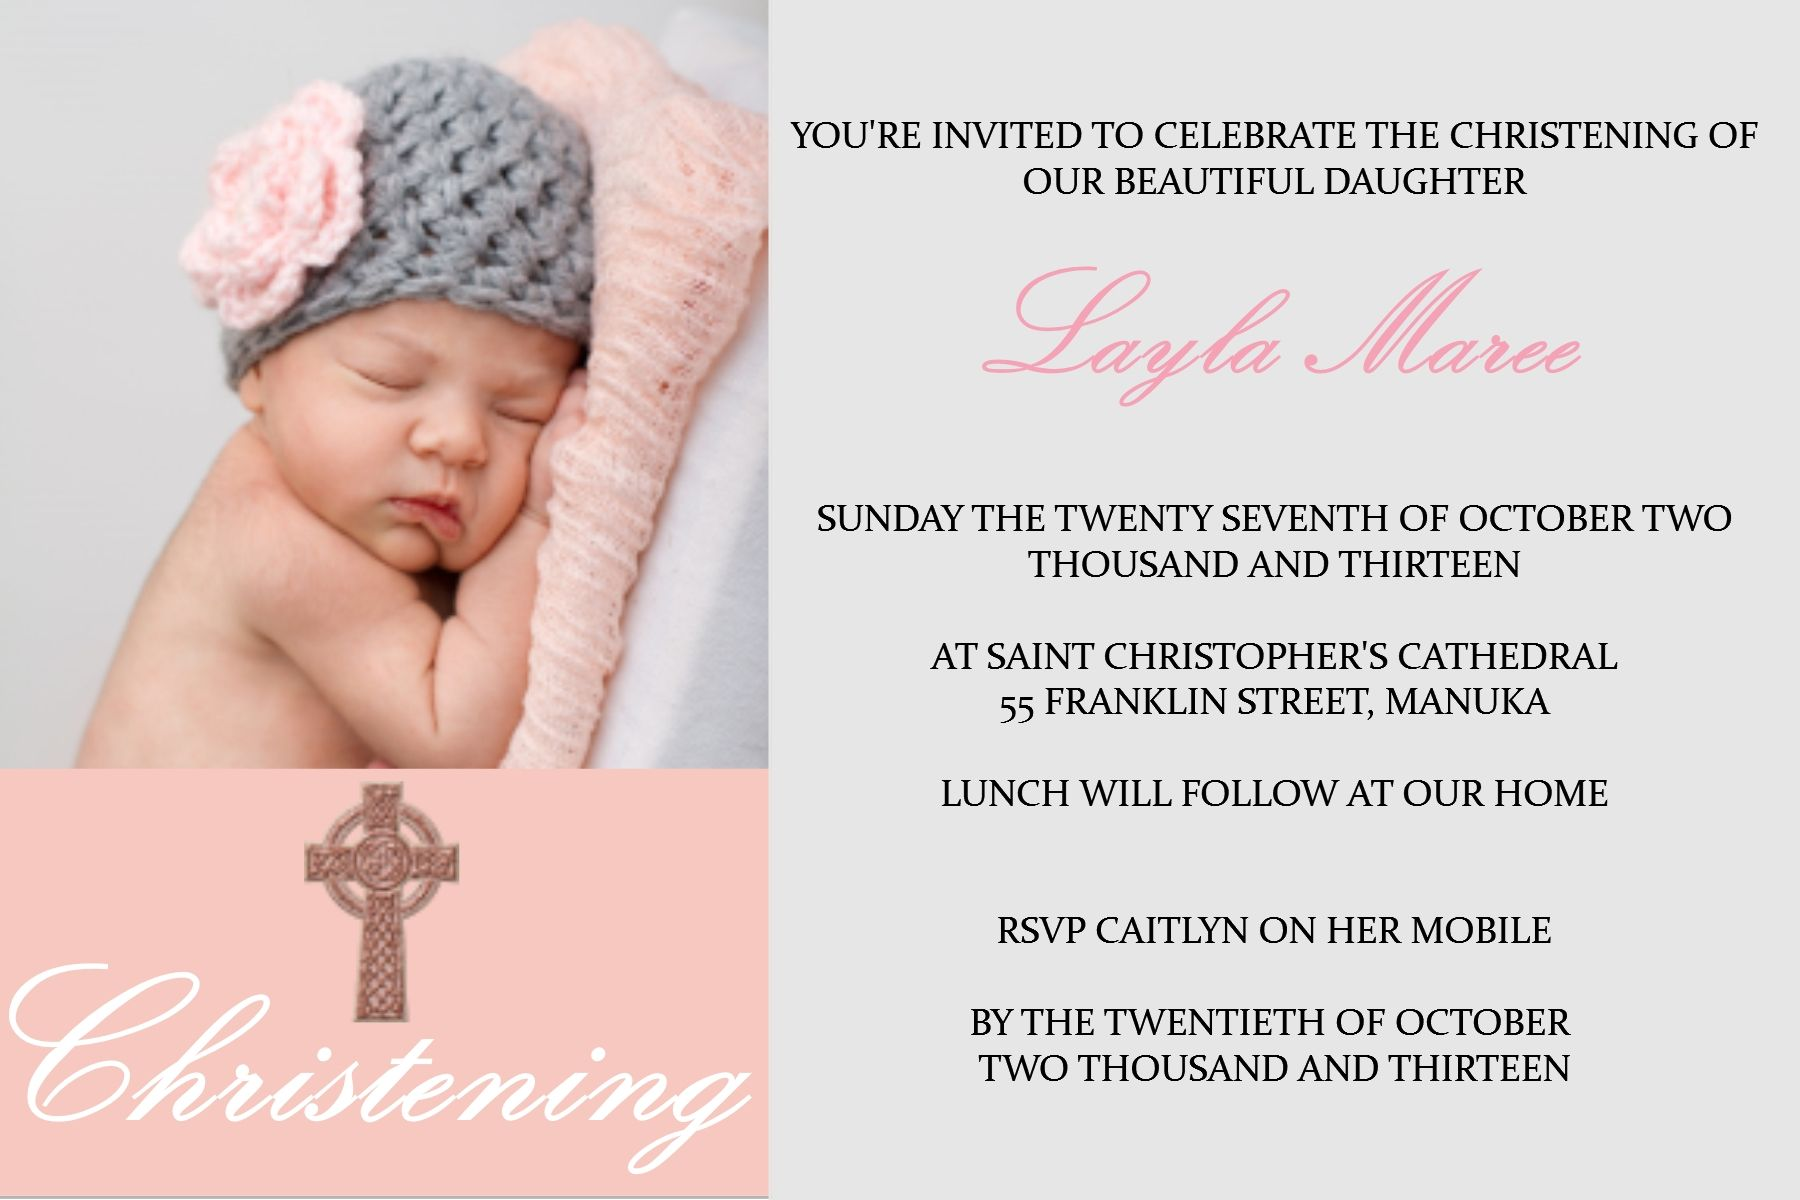 Baby Girl Christening Invitation By Platinum Invitations & Candy ...